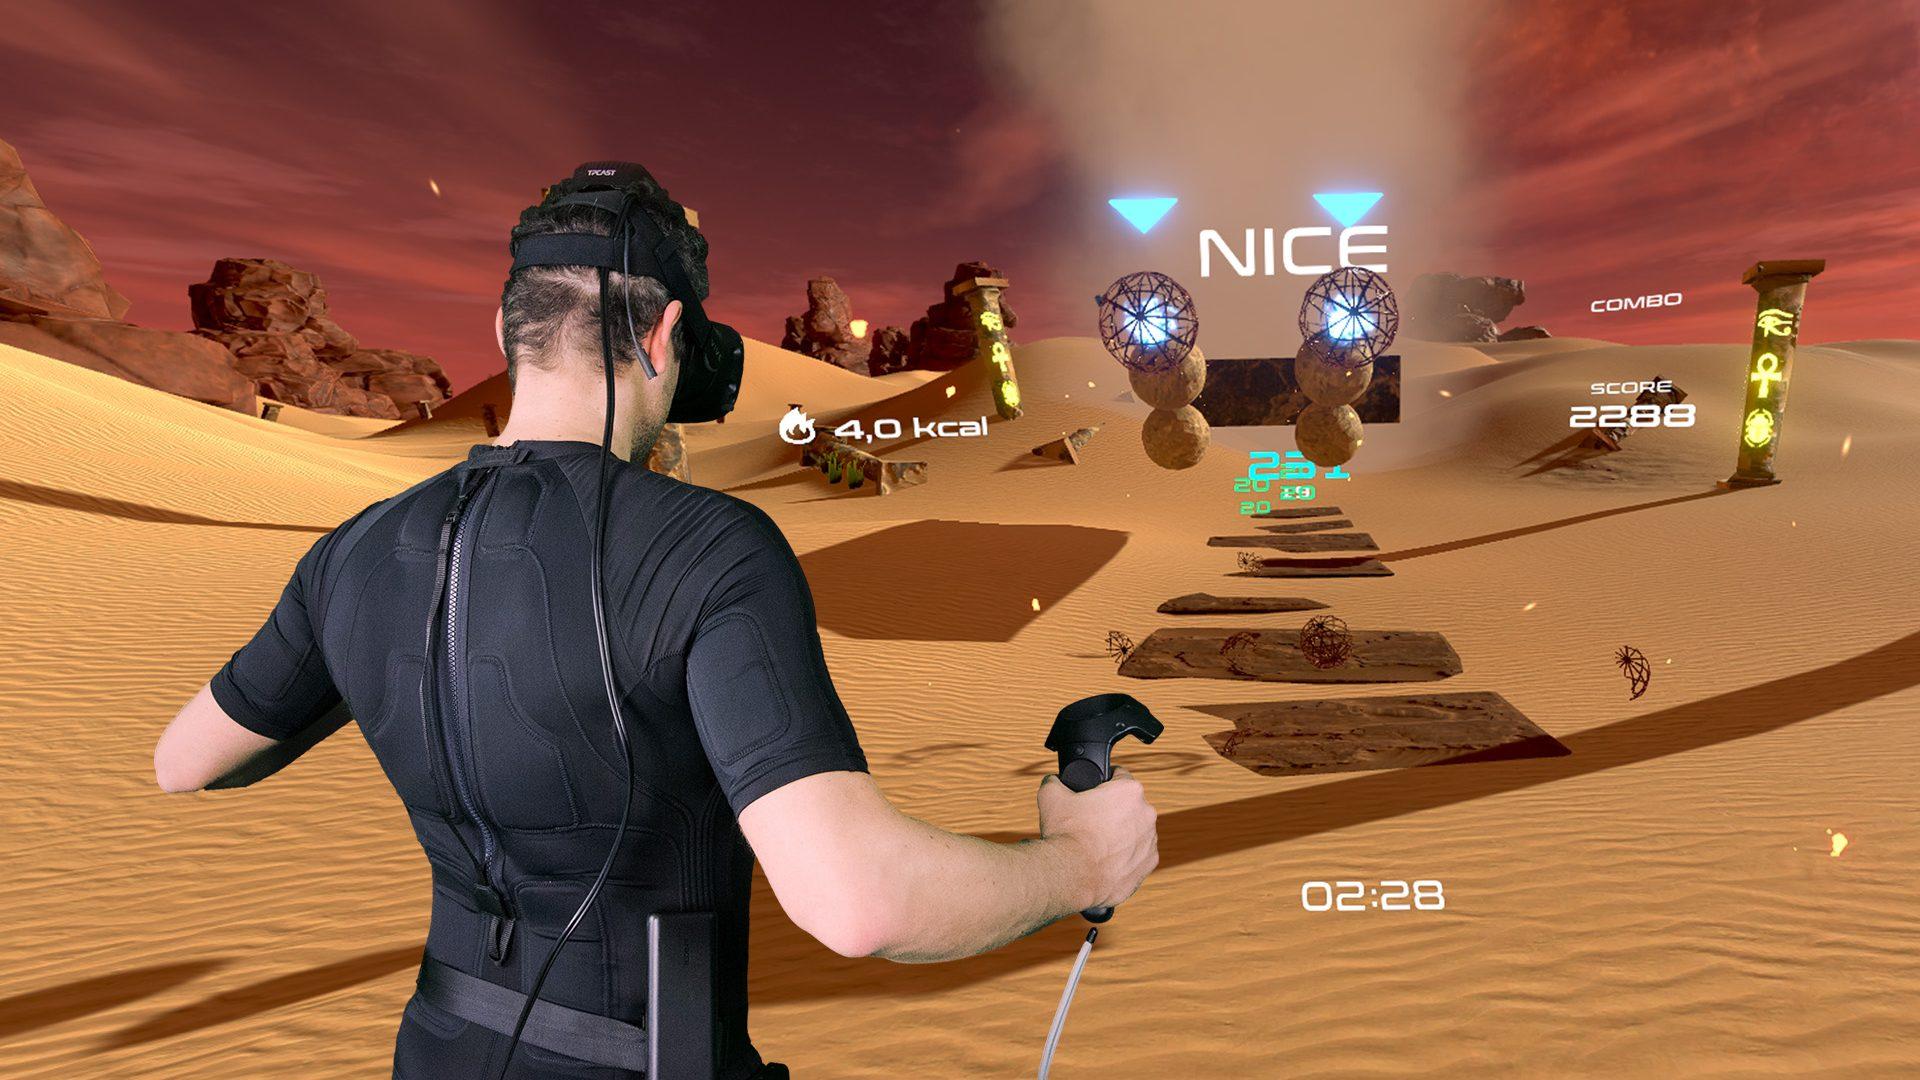 PowerBeatsVR - VR Fitness - Mixed Reality Recording